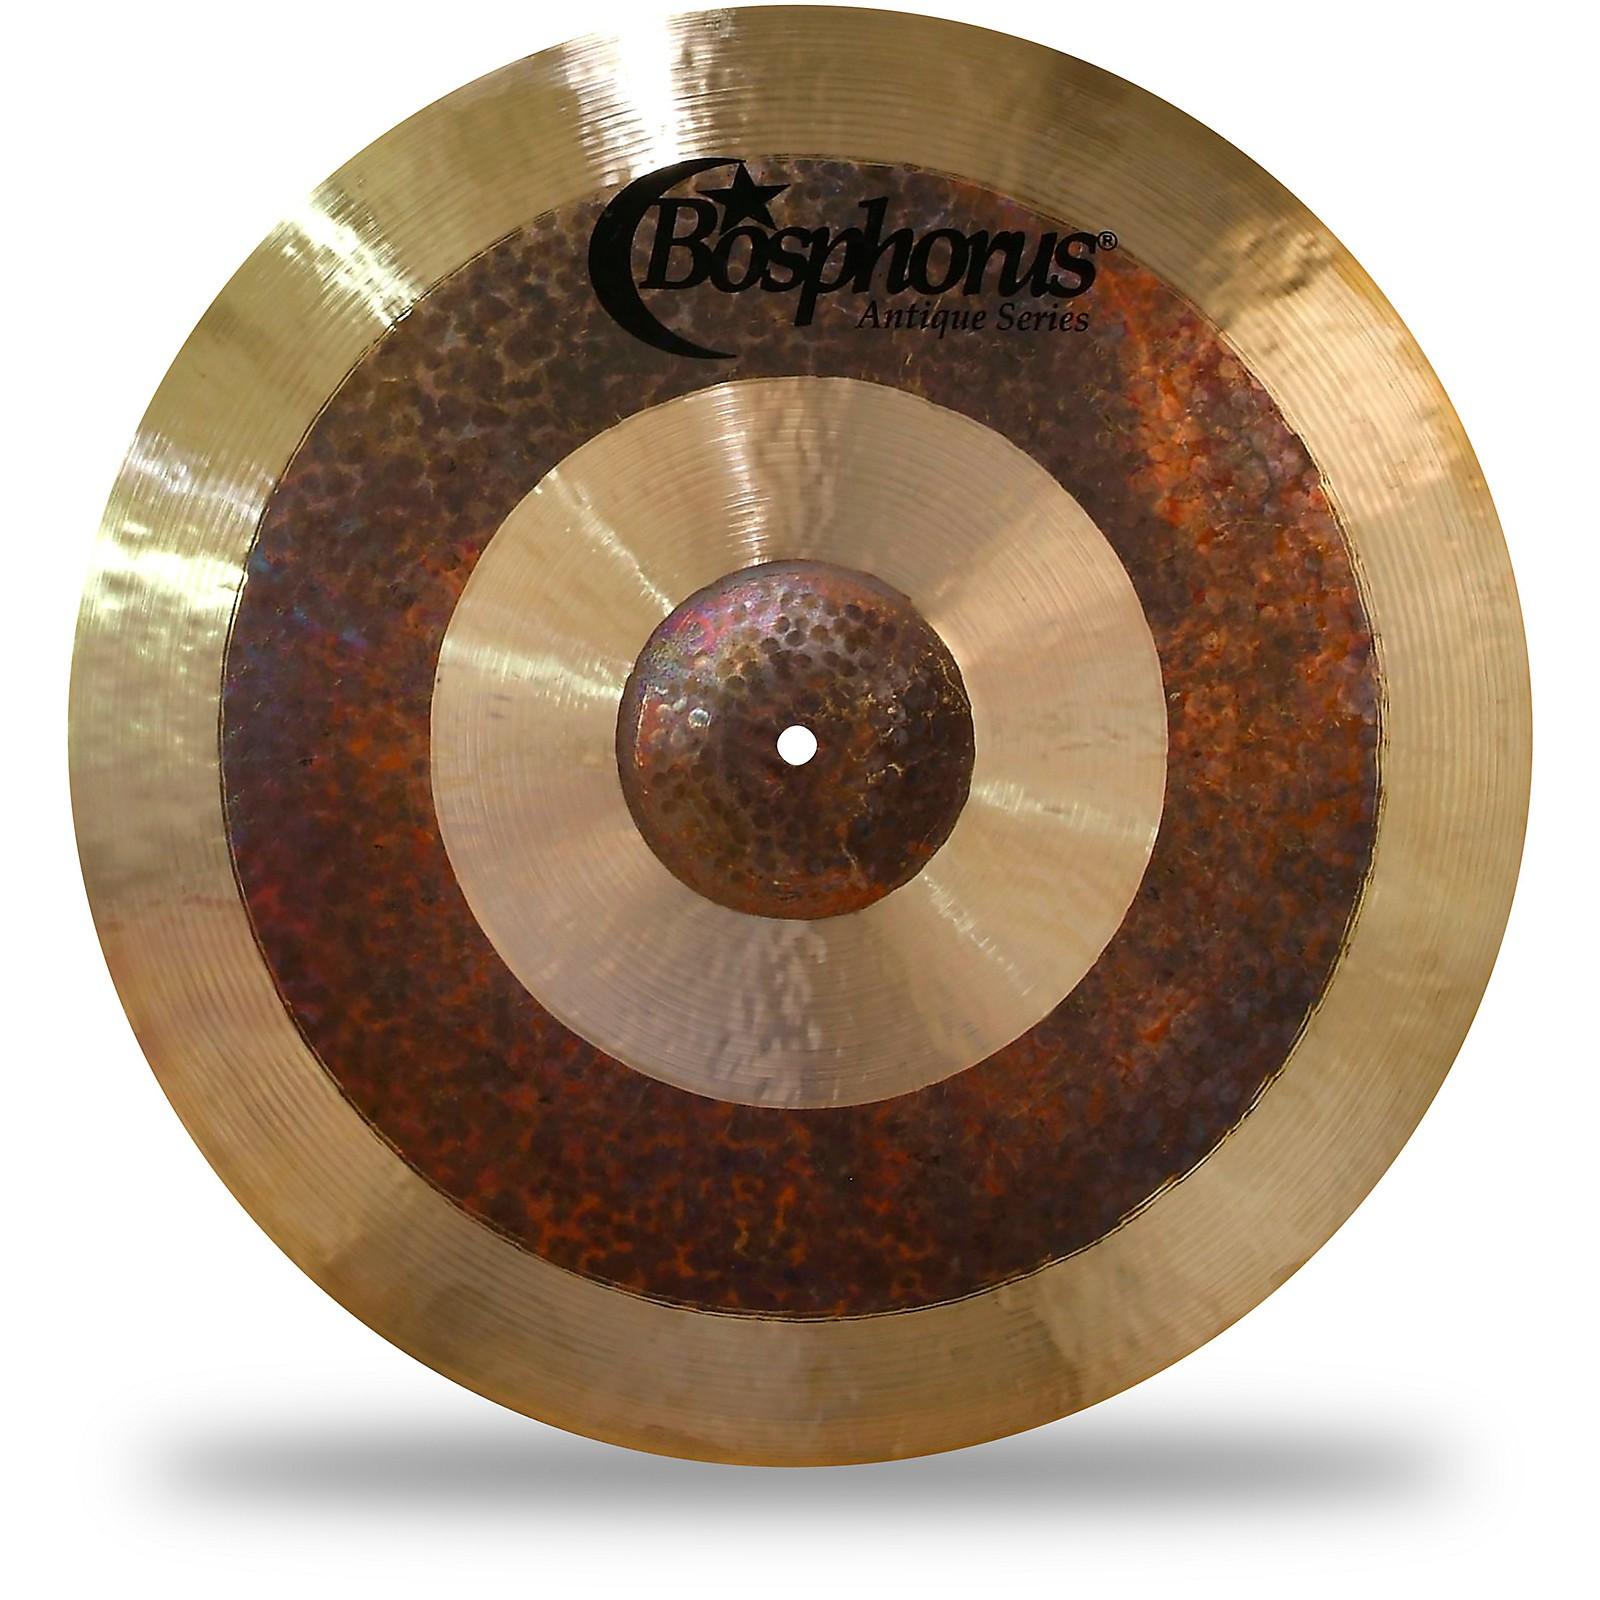 Bosphorus Cymbals Antique Ride Cymbal